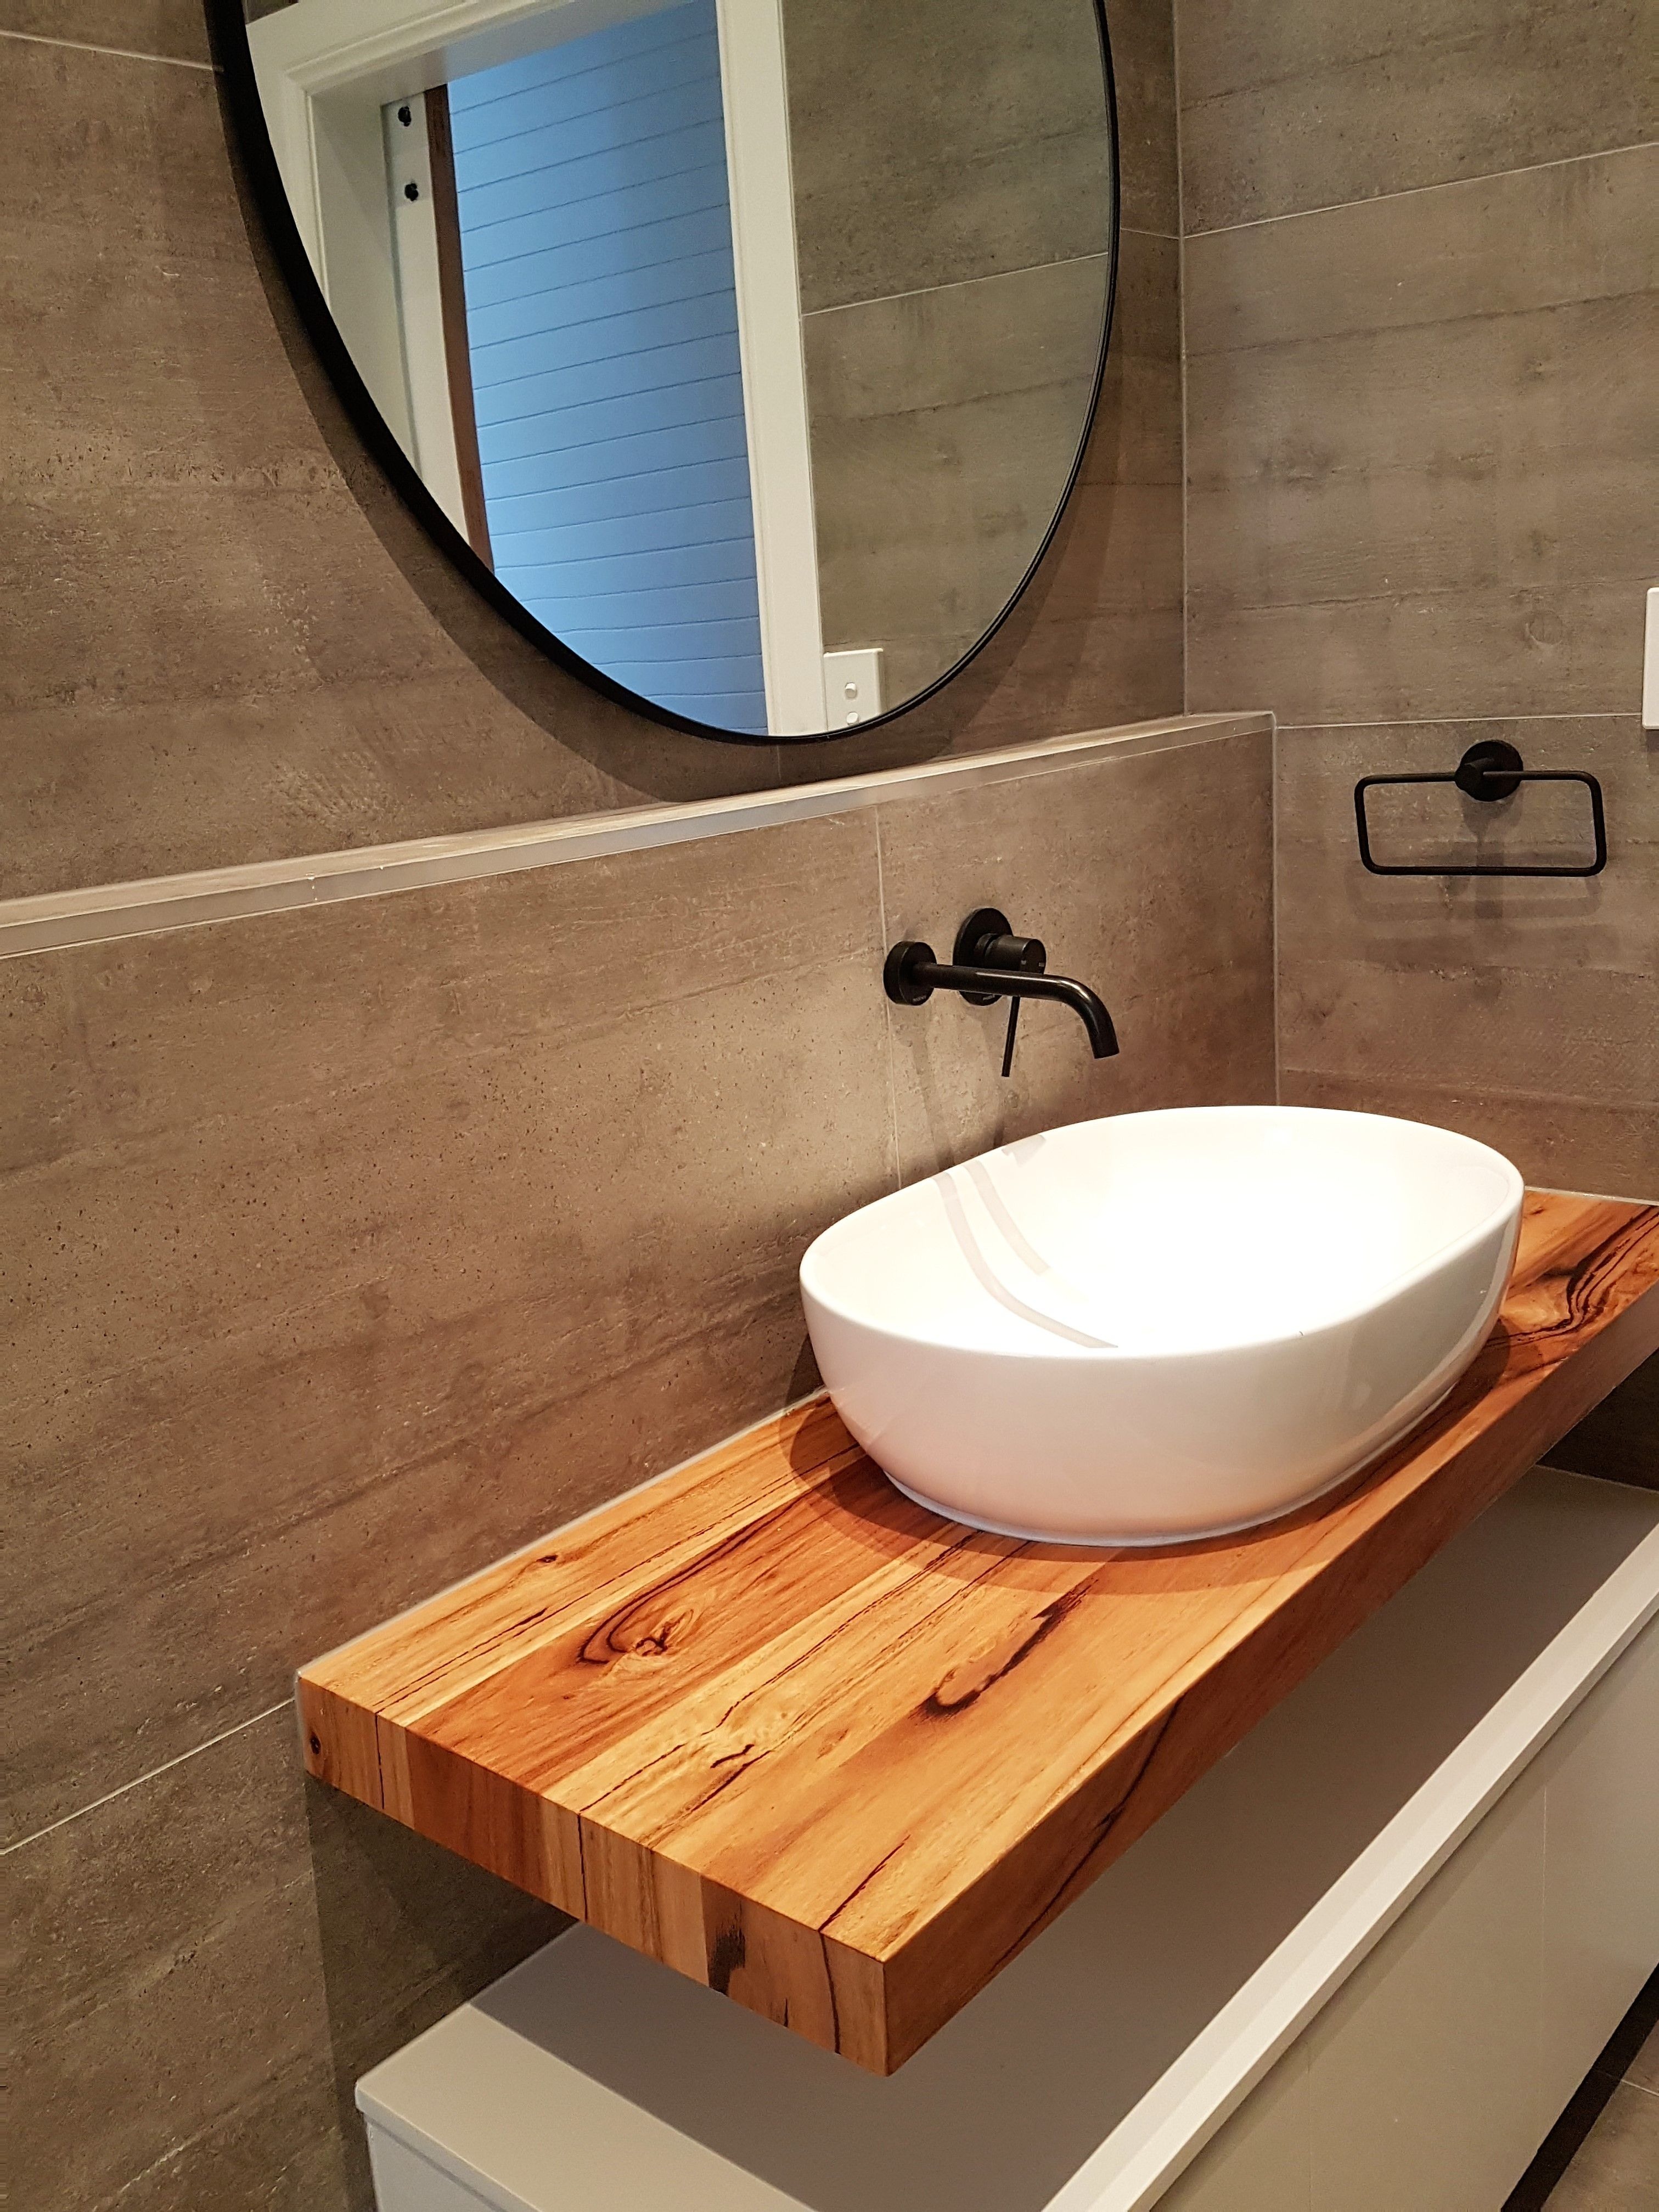 This Vanity Top Is Made From Our Mixed Hardwood Range Choosing Detailed Blonde Tones Creating A Beautiful Fe Custom Vanity Timber Vanity Round Mirror Bathroom